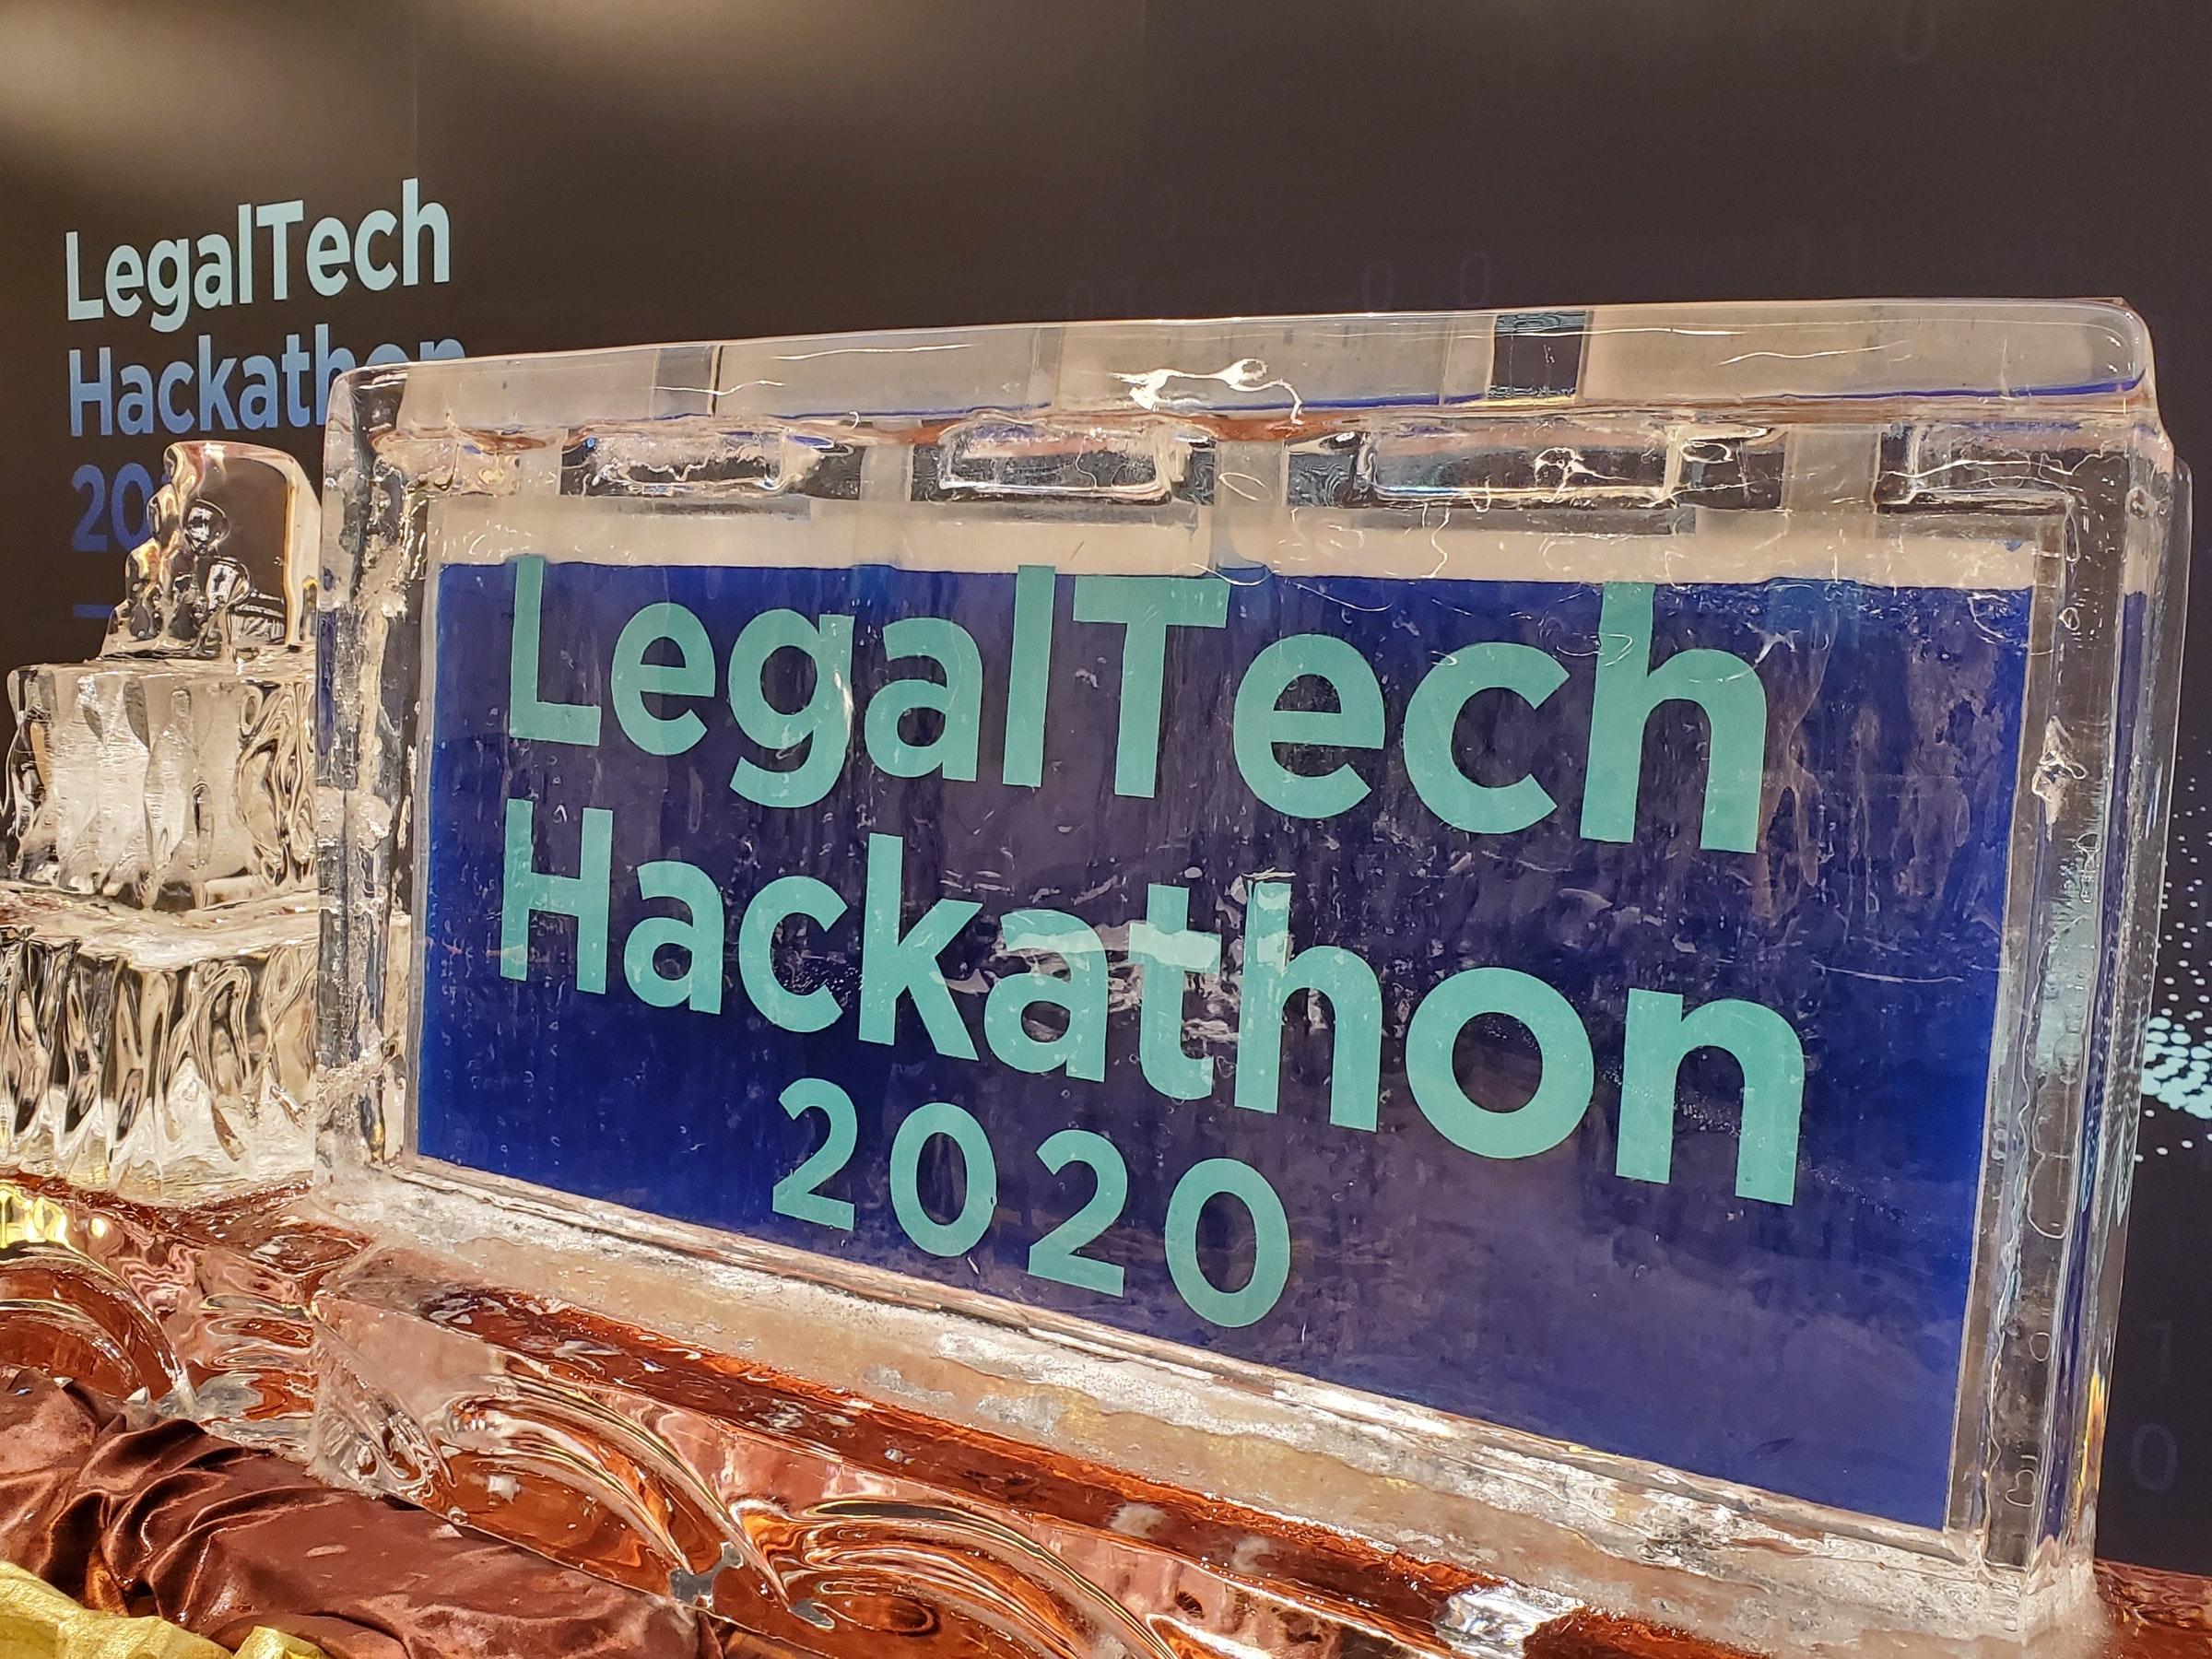 照片中提到了LegalTech、Hackathan、206,包含了字形、儀表